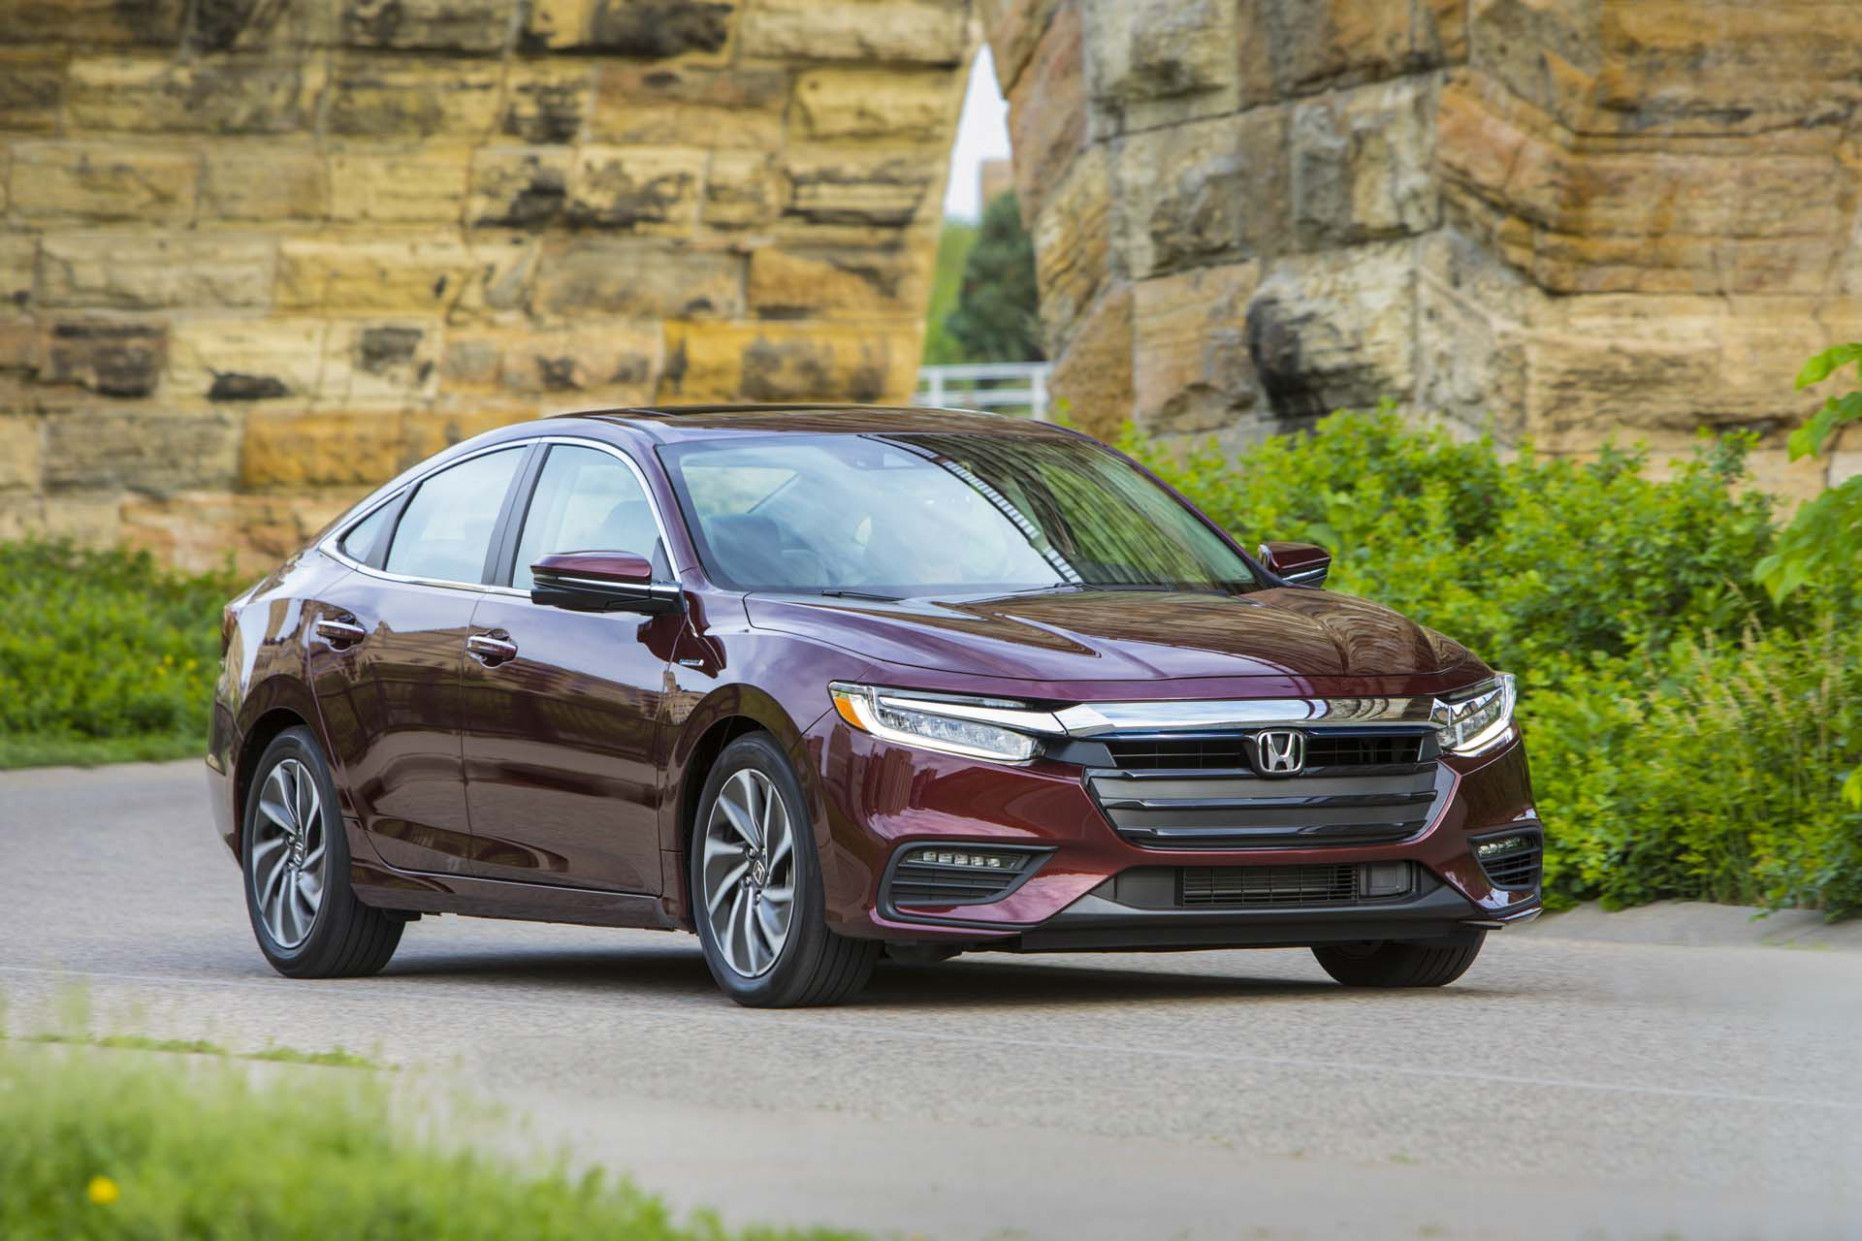 6 Picture Honda Insight 2020 Specs in 2020 Honda insight